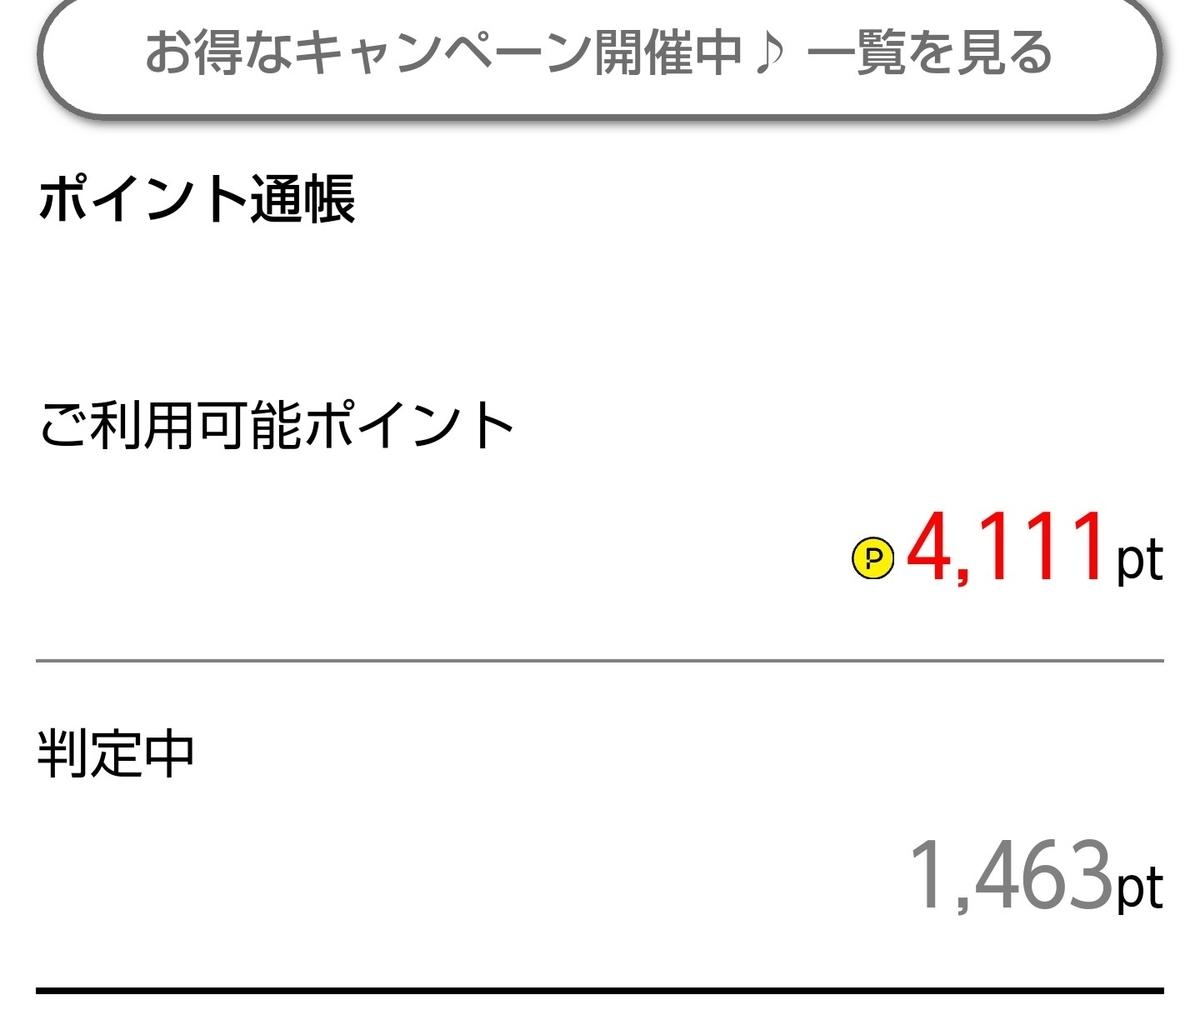 f:id:hyumama:20210612103129j:plain